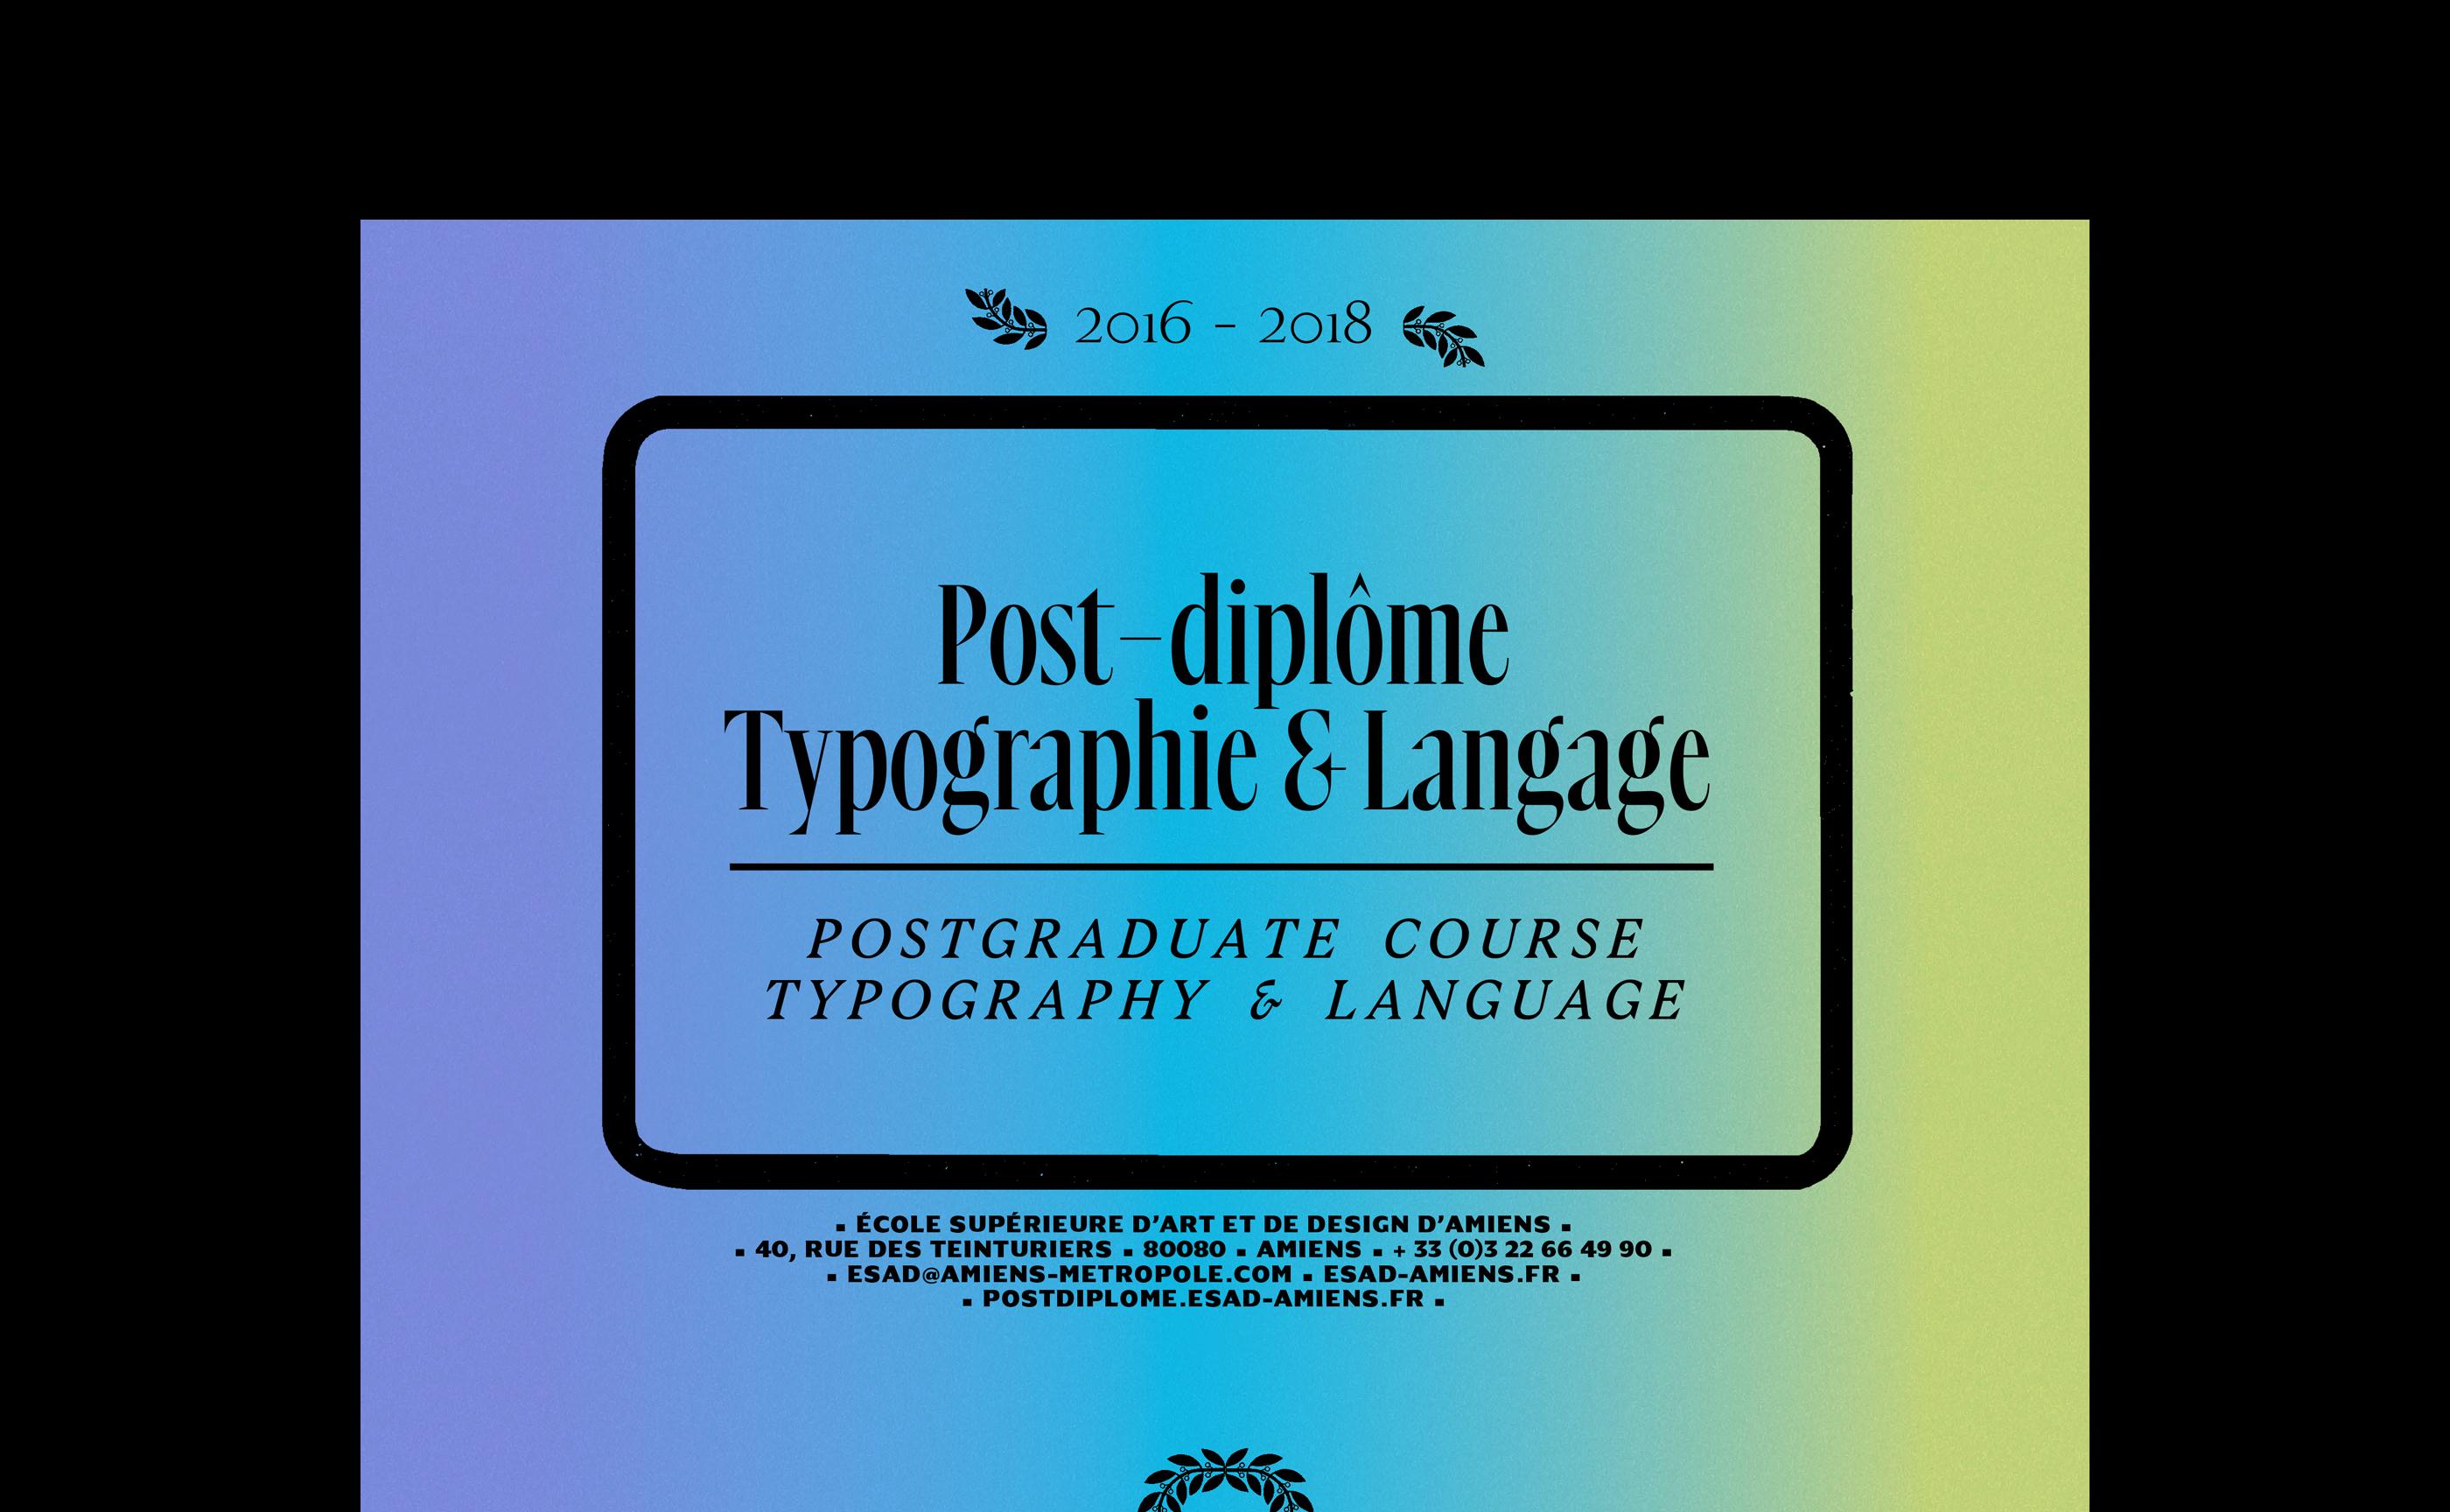 Post-diplôme typographie et langage